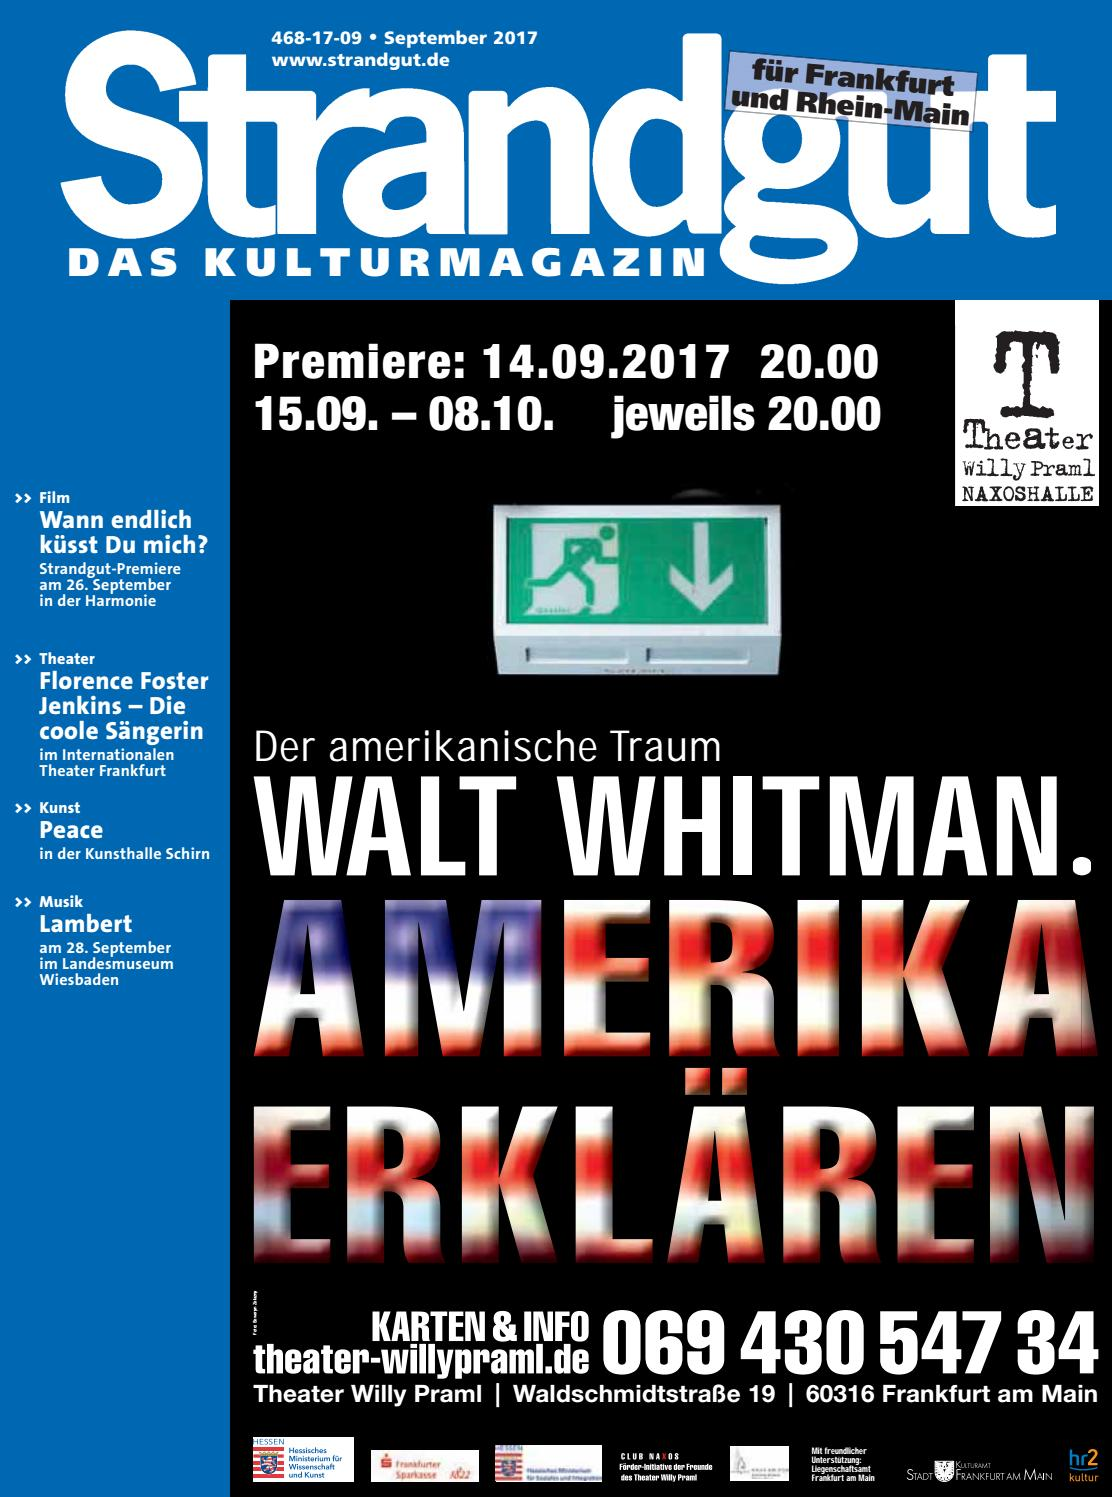 Strandgut 09/2017 by Strandgut Kulturmagazin - issuu